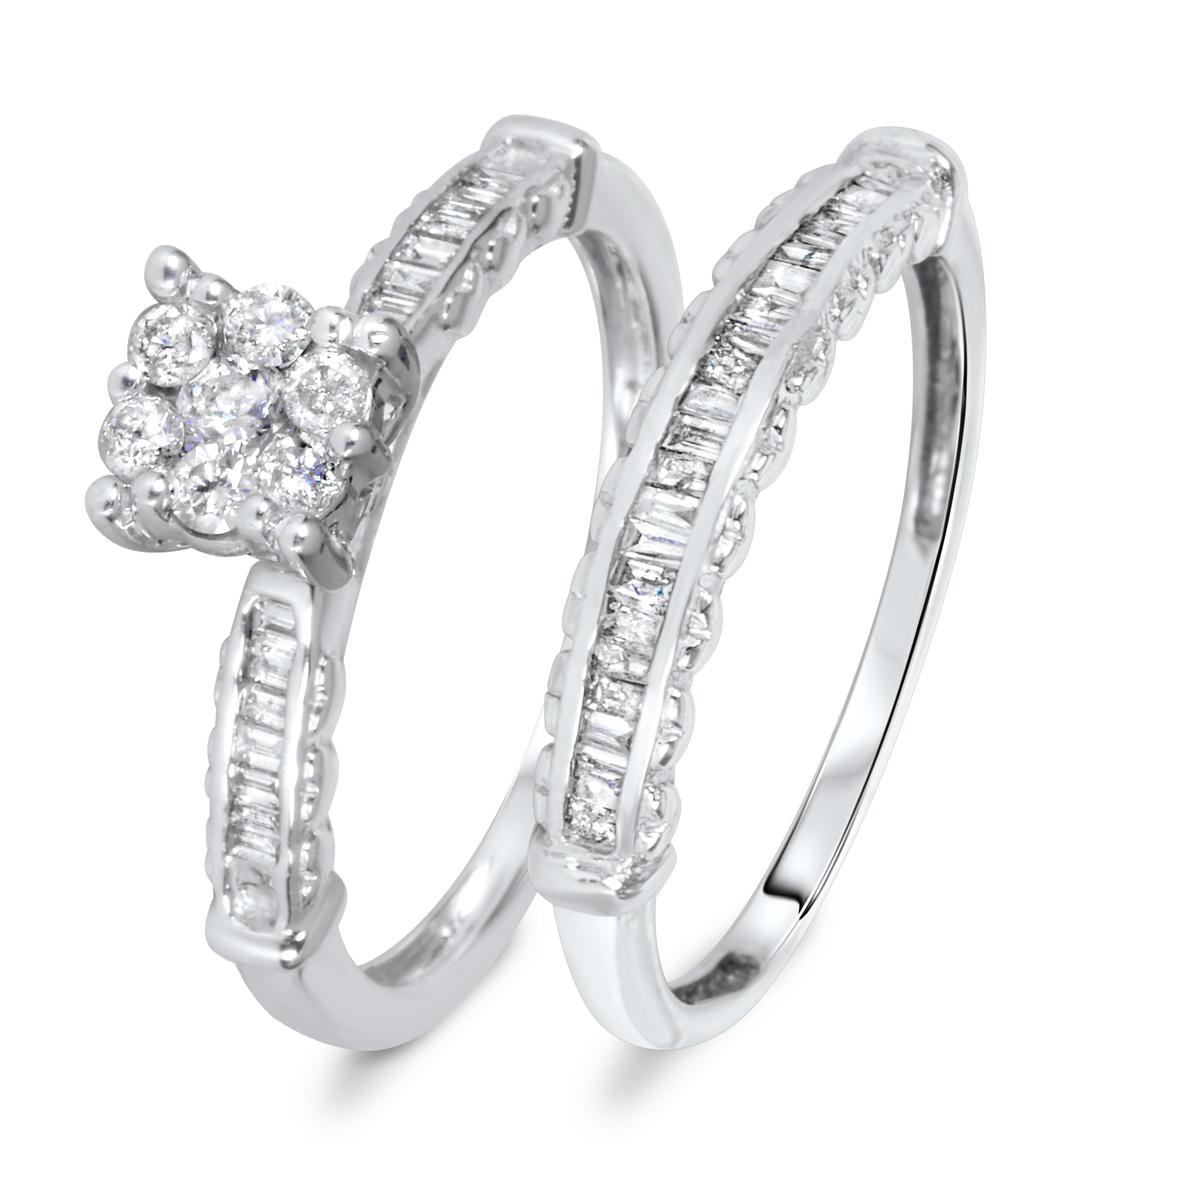 5/8 CT. T.W. Diamond Women's Bridal Wedding Ring Set 10K White Gold